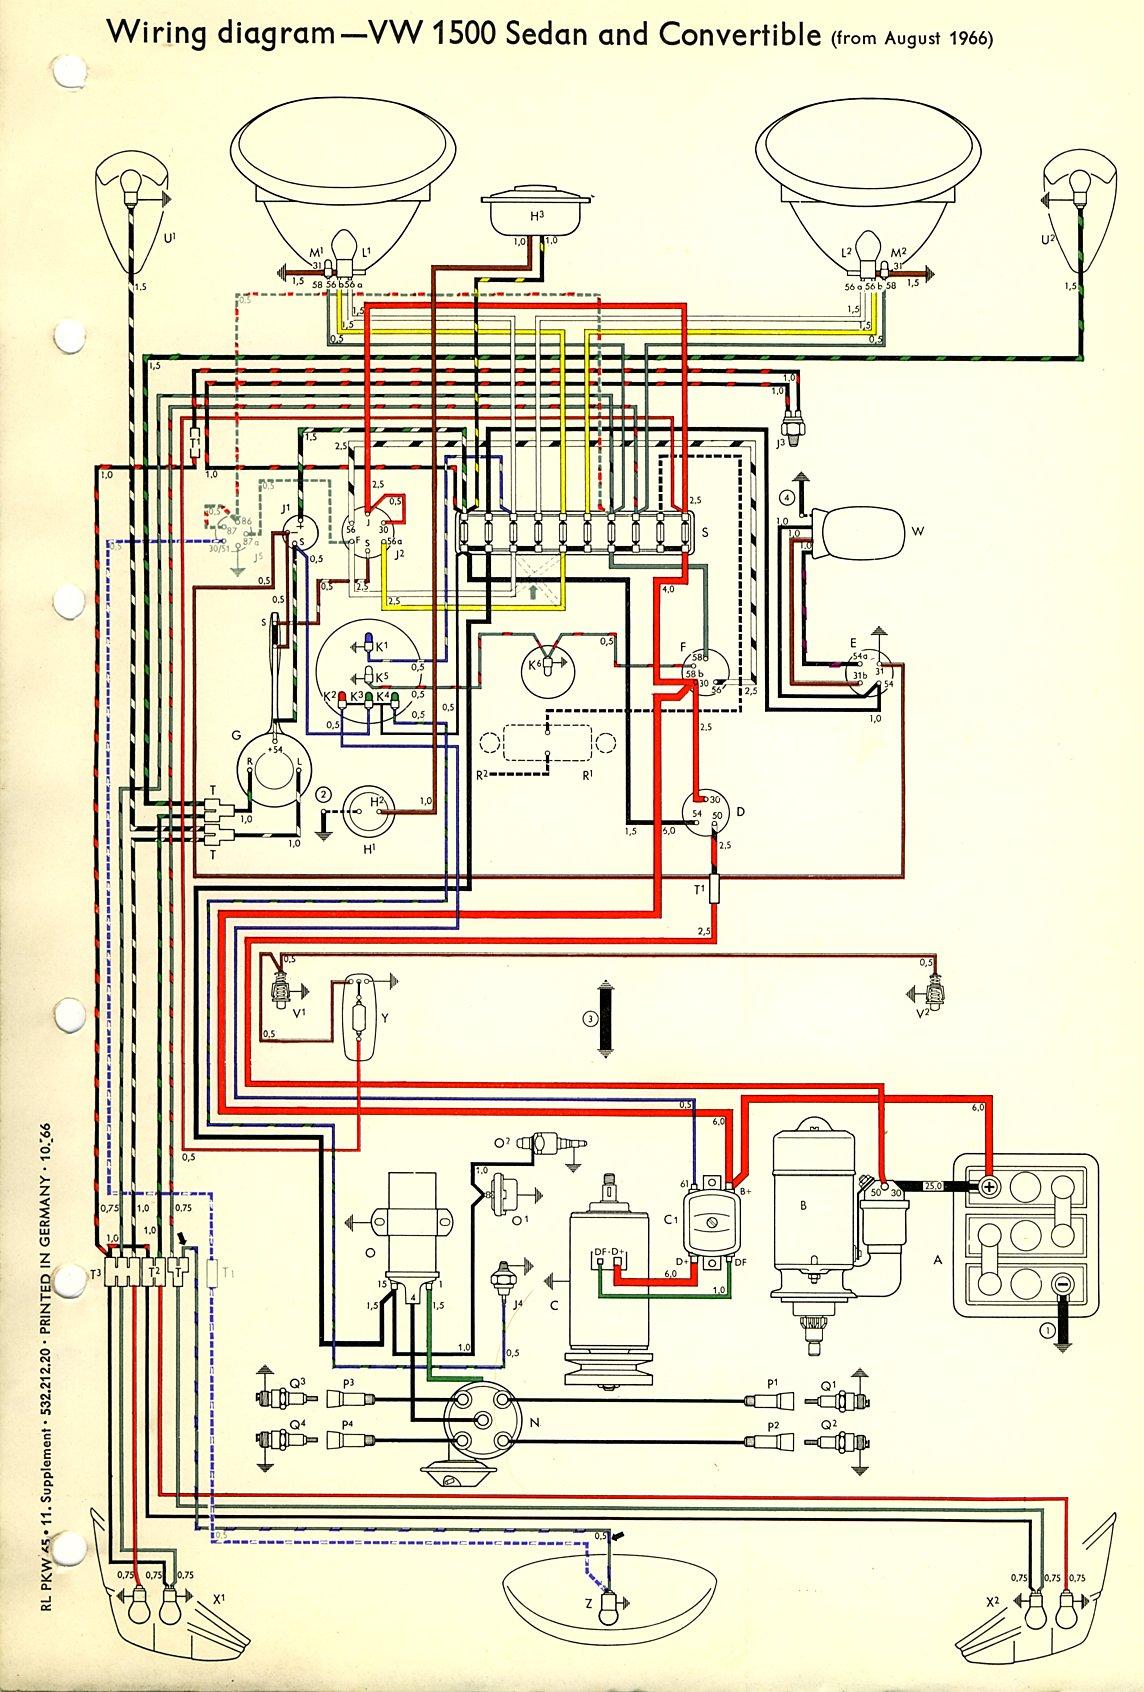 2000 Saturn Ignition Switch Wiring Diagram Ls2 Fuse Sl2 Detailed Diagrams Rh Standrewsthorntonheath Co Uk Radio Bmc